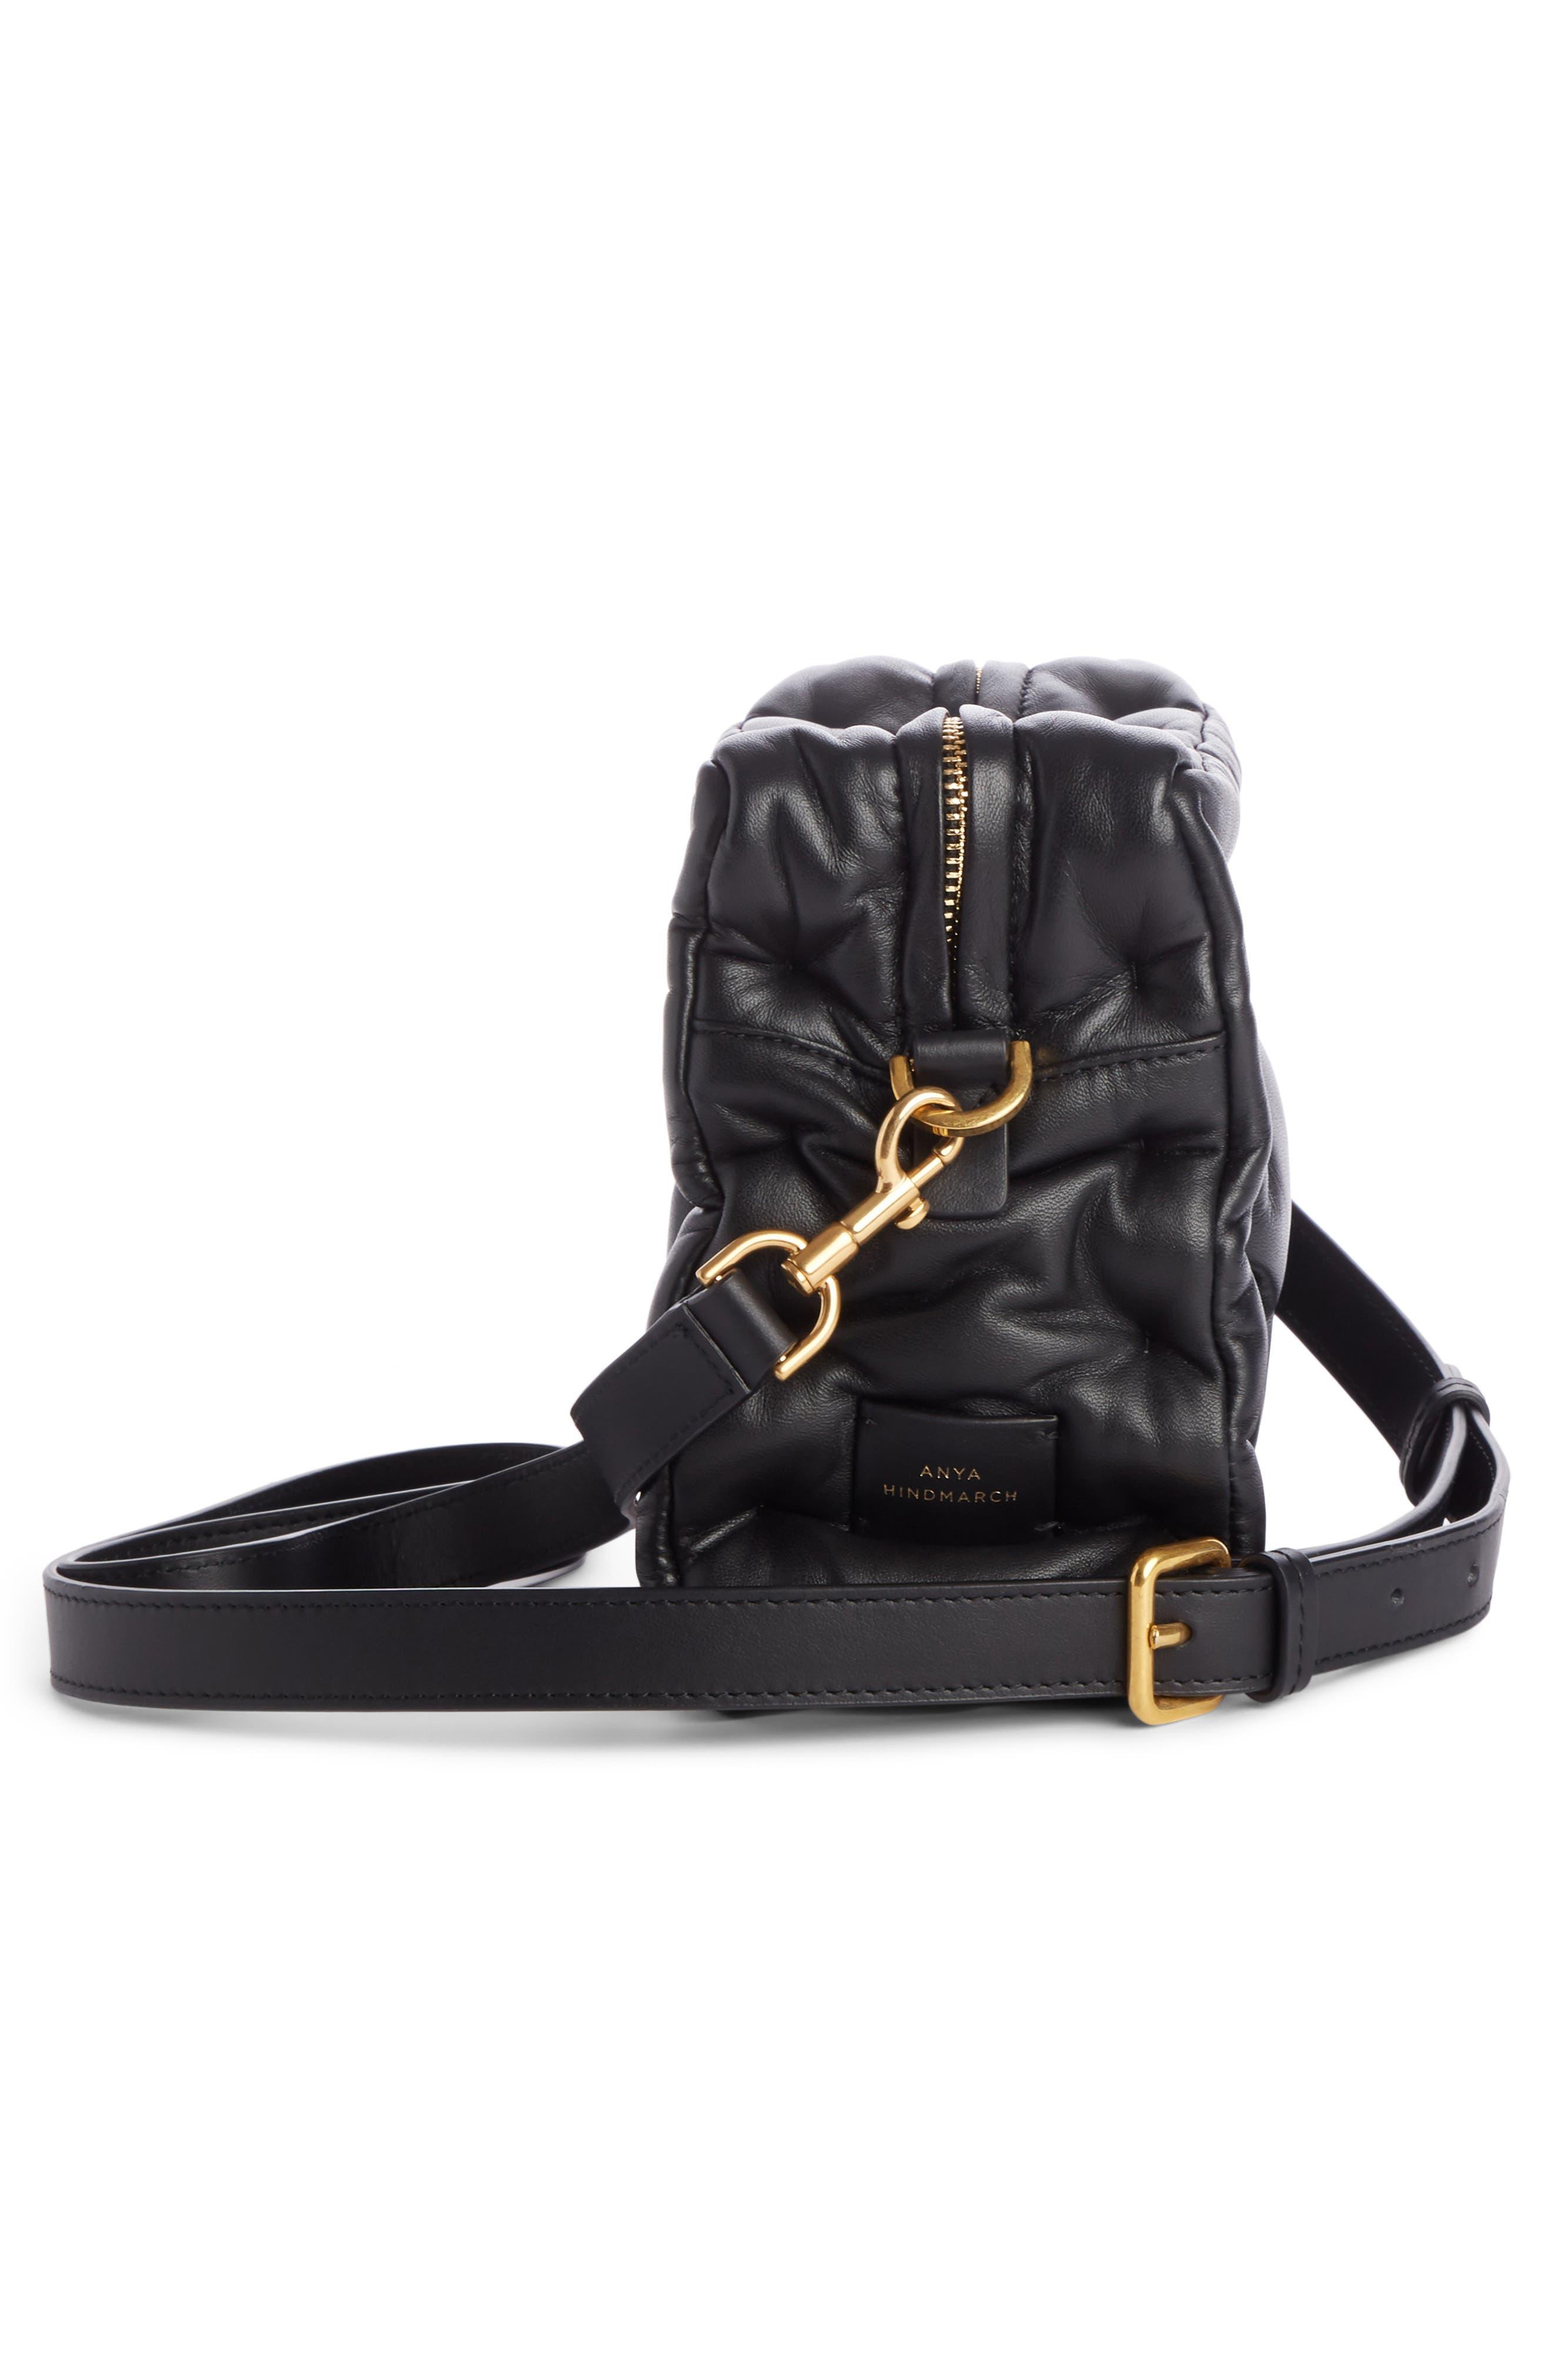 Chubby Cube Leather Crossbody Bag,                             Alternate thumbnail 3, color,                             BLACK